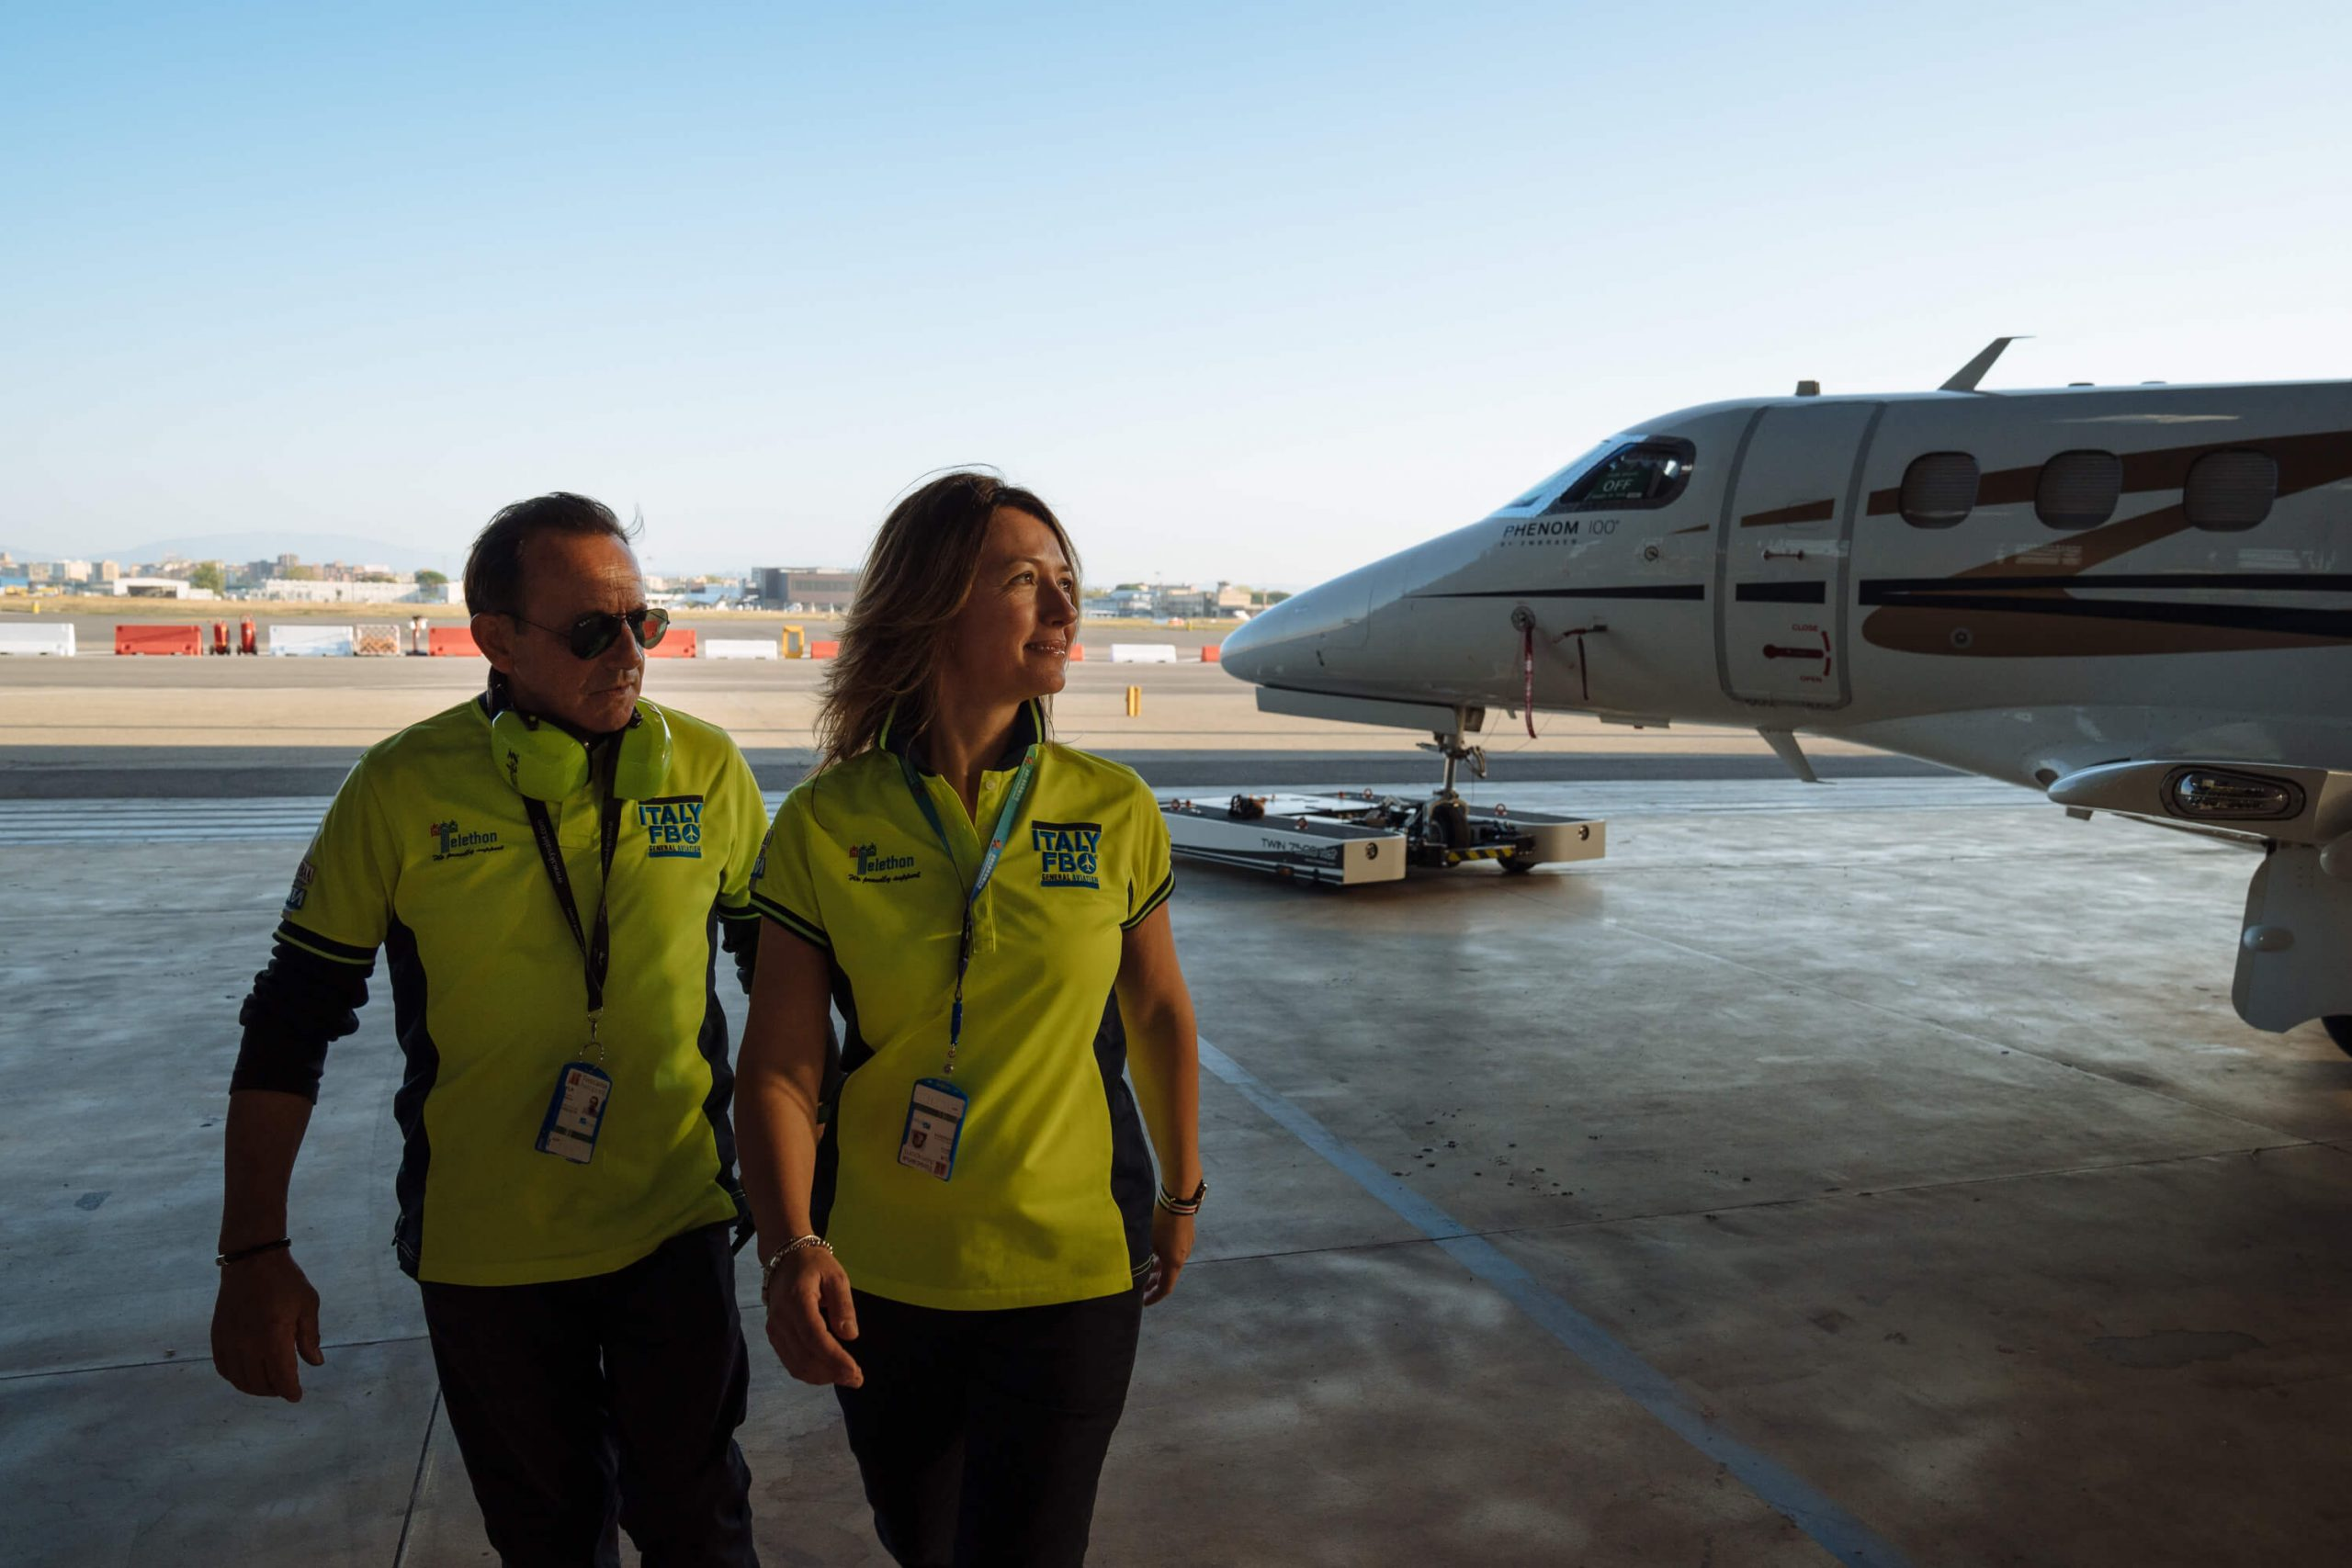 Aircraft services